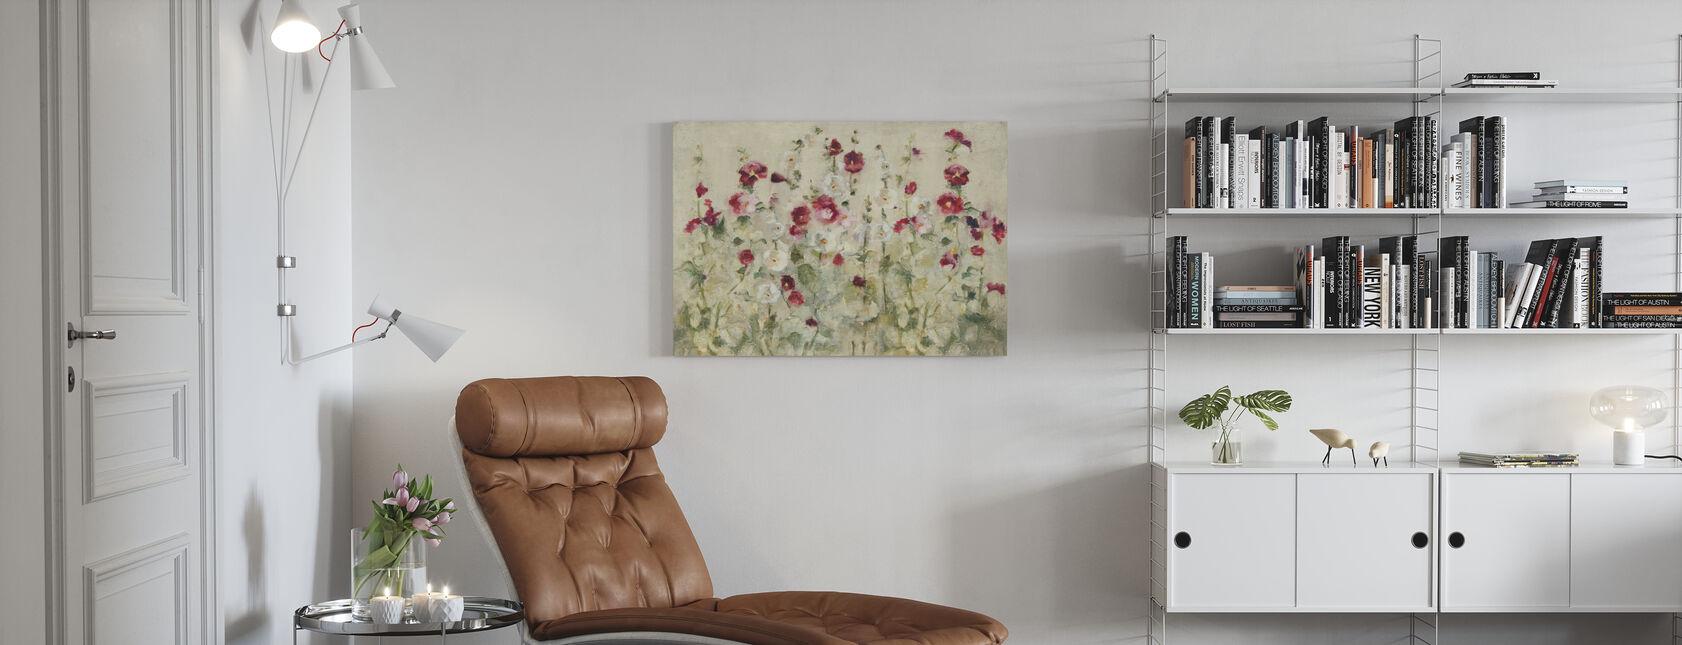 Hollyhocks Row Cool - Leinwandbild - Wohnzimmer